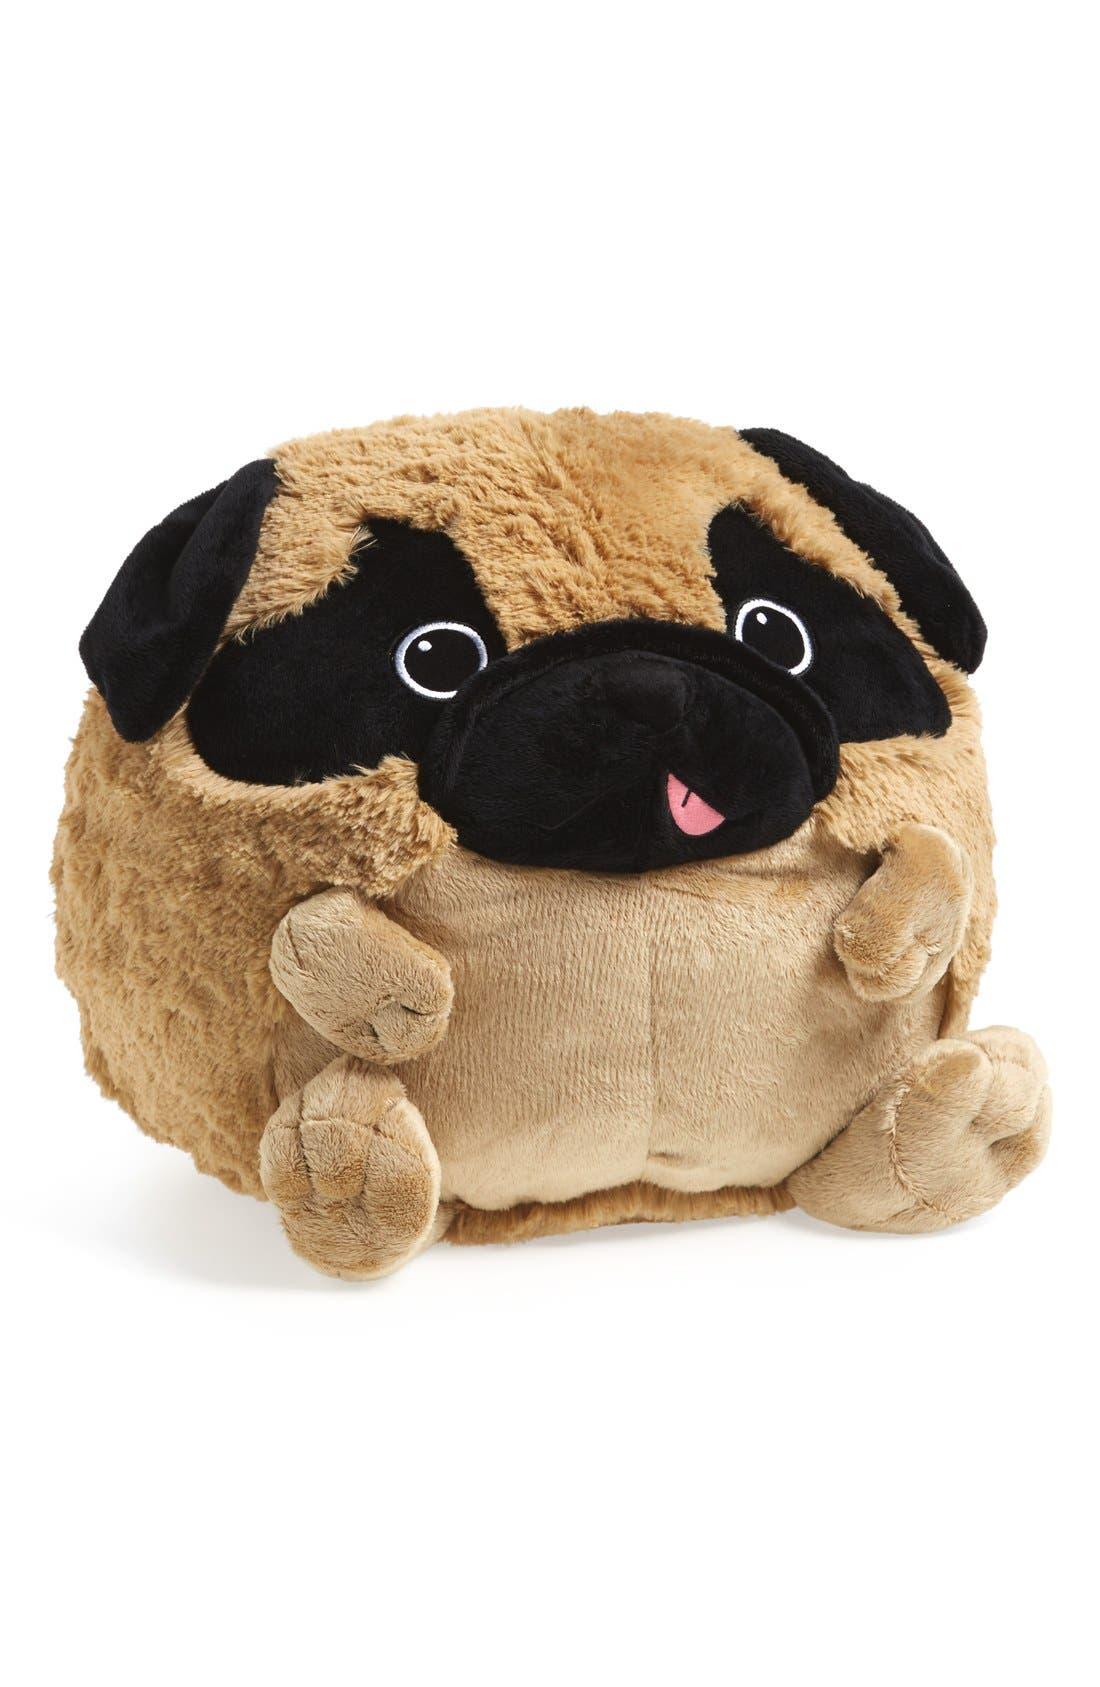 Alternate Image 1 Selected - Squishable 'Pug' Stuffed Animal